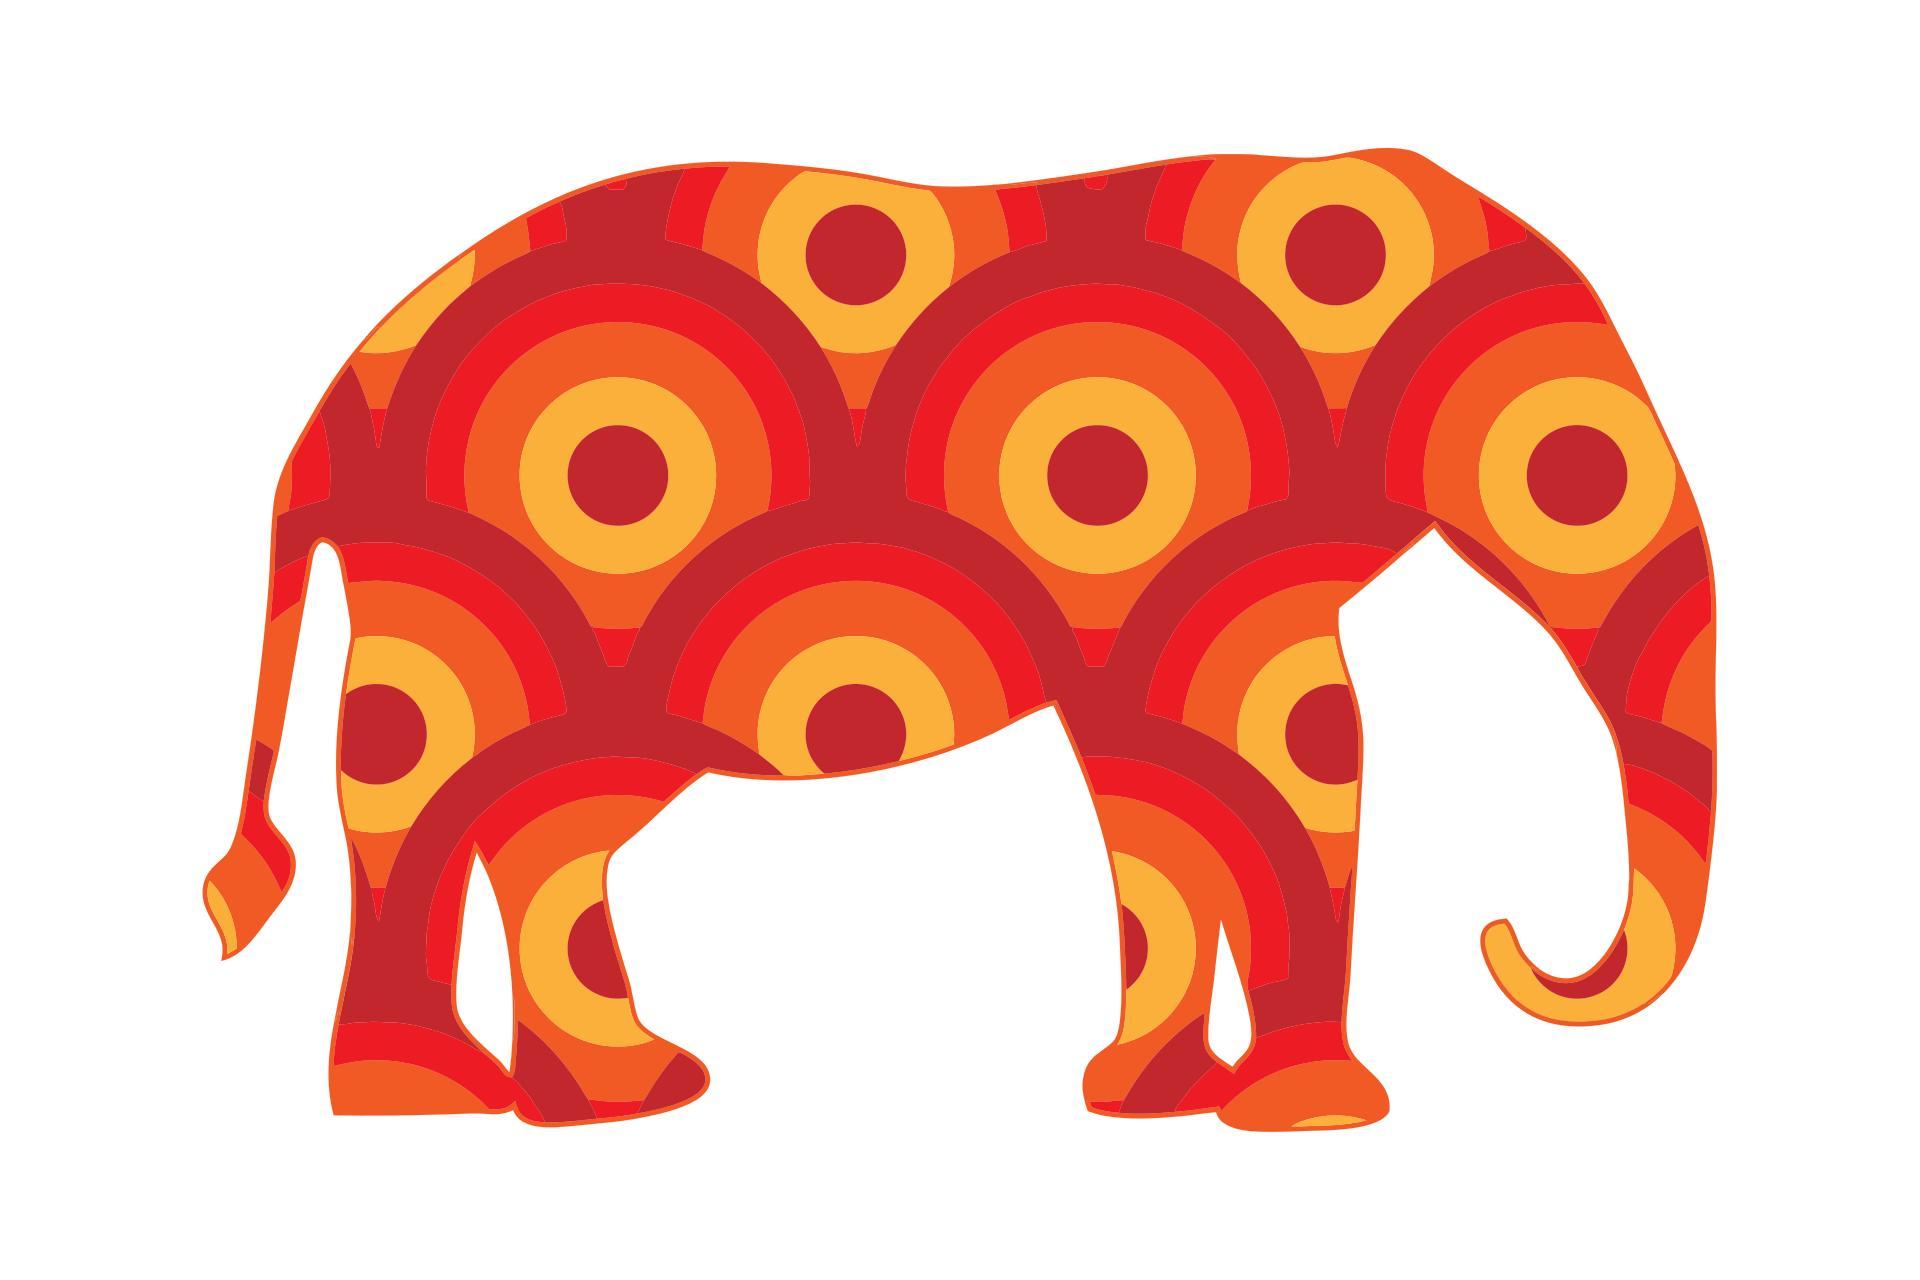 1920x1280 Retro Circles Elephant Clipart